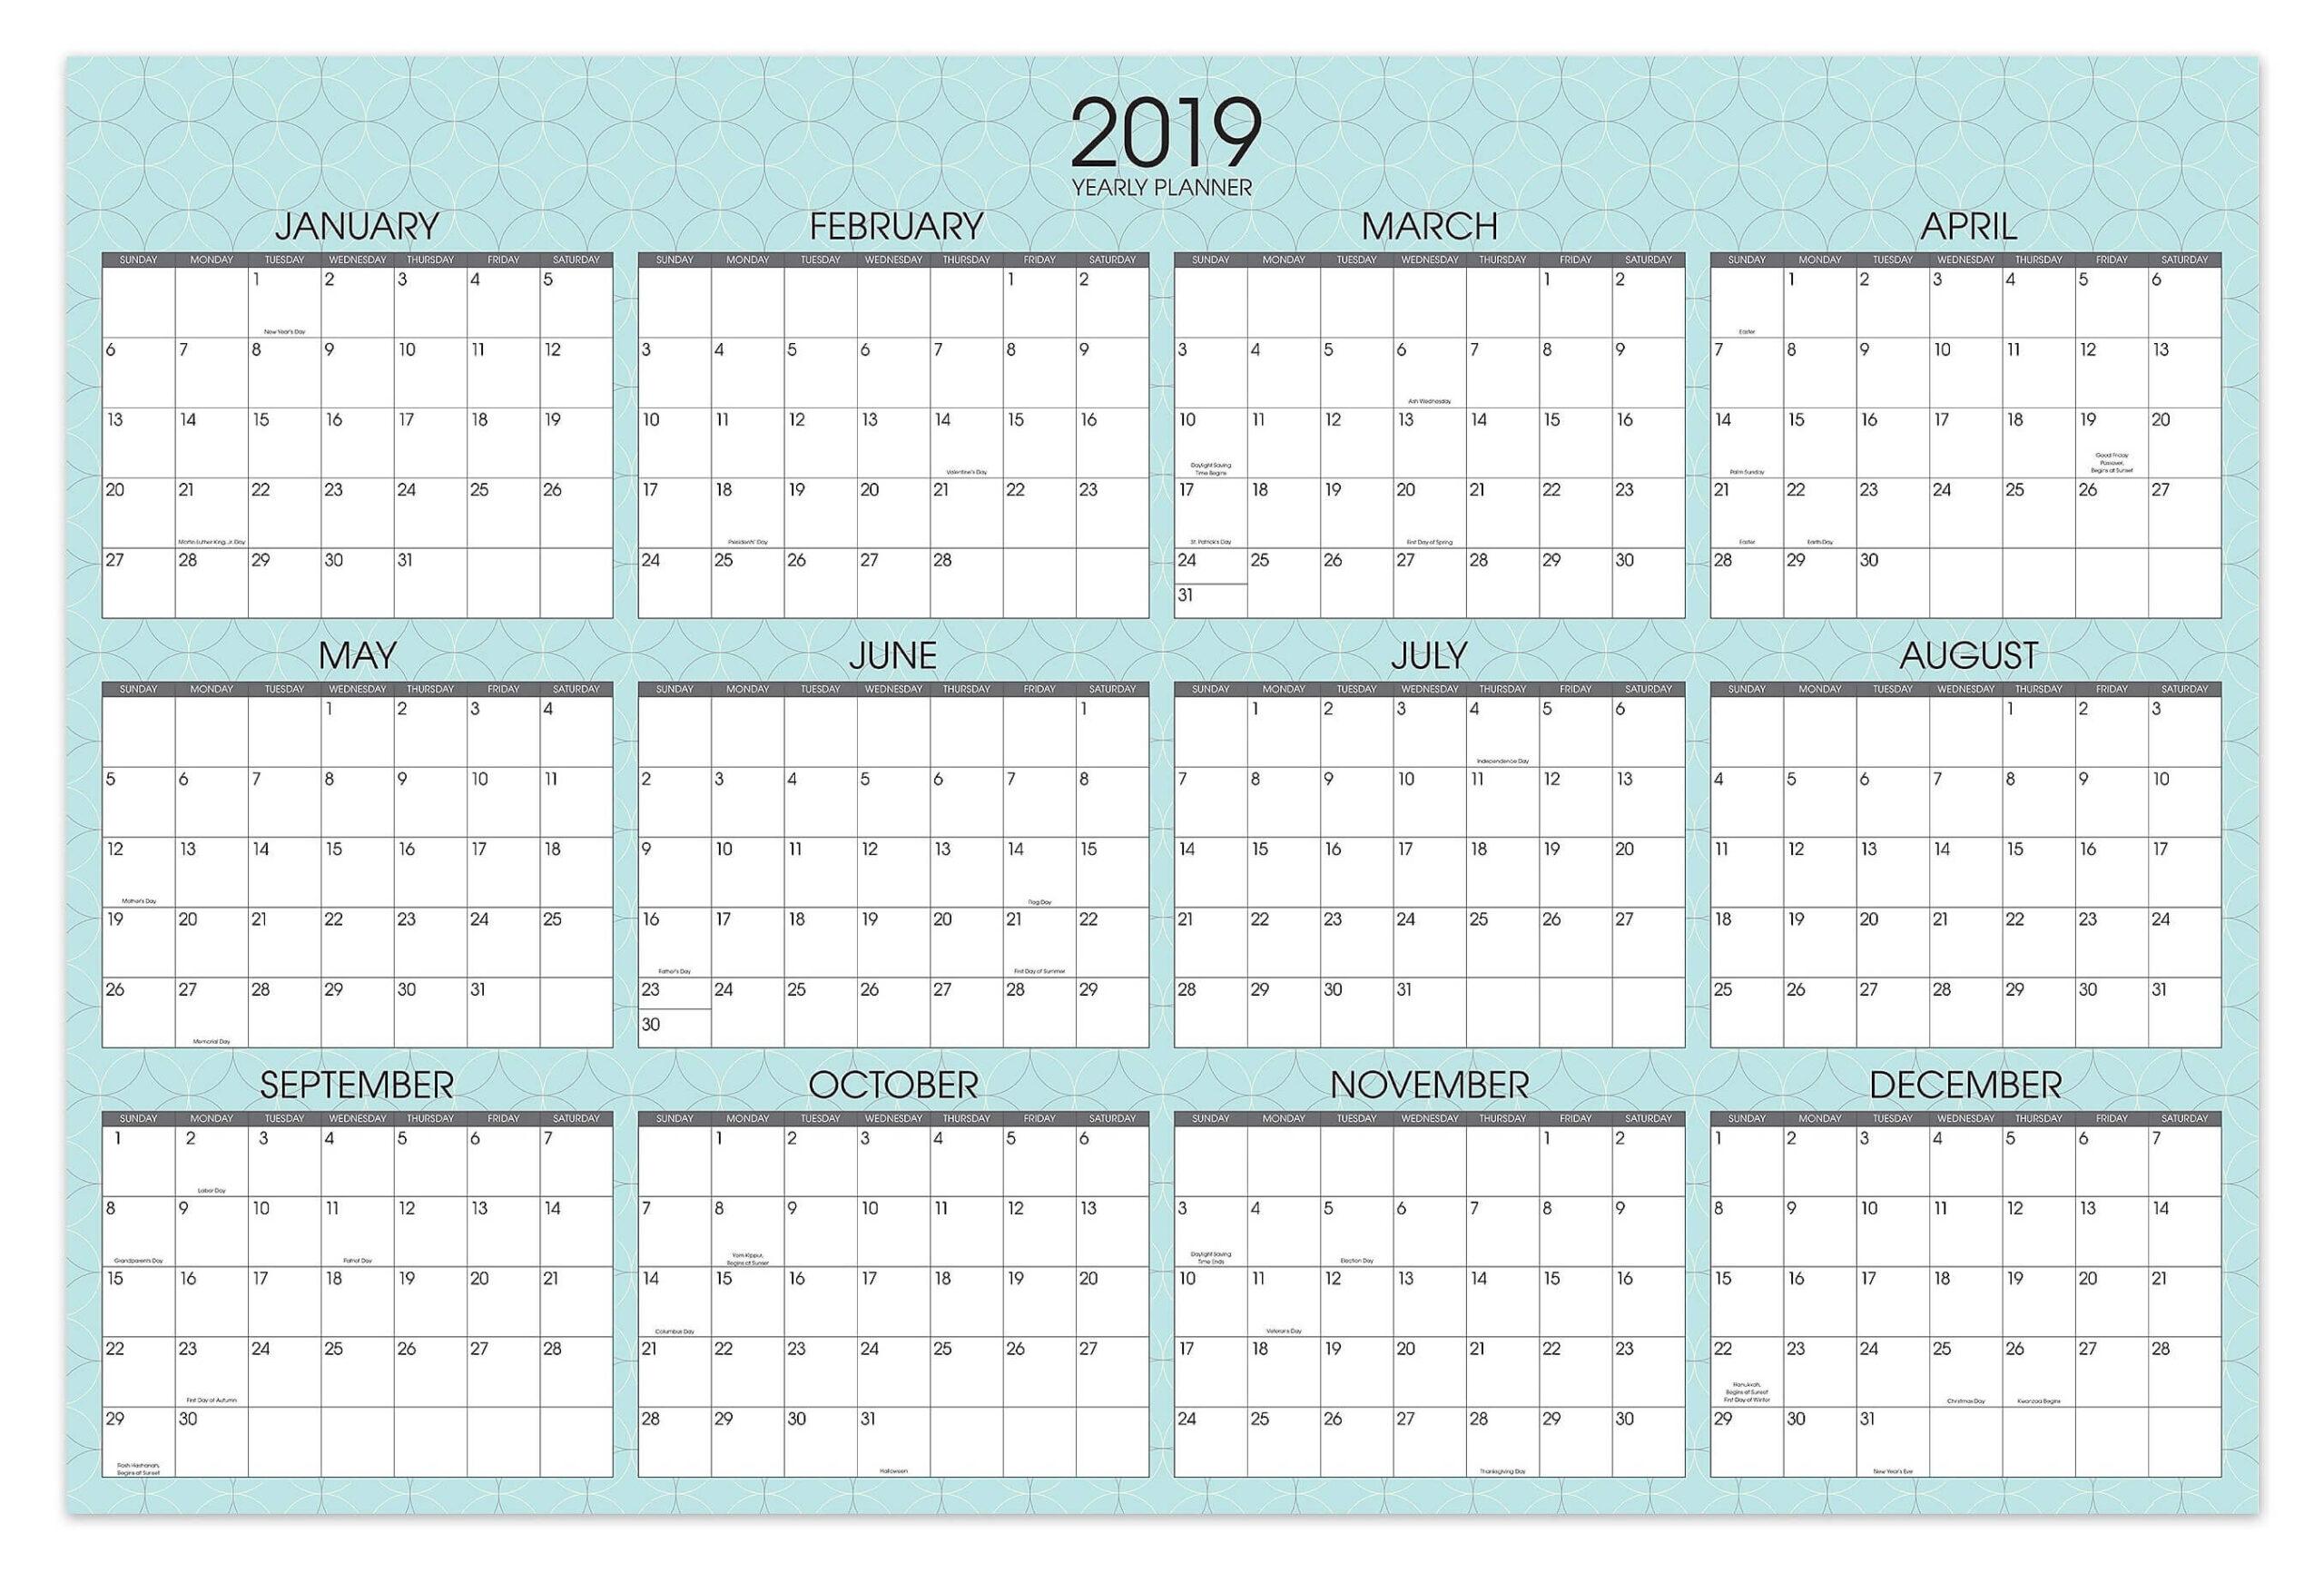 Calendar Templates By Vertex42 | Example Calendar inside Vertex Free Calendar